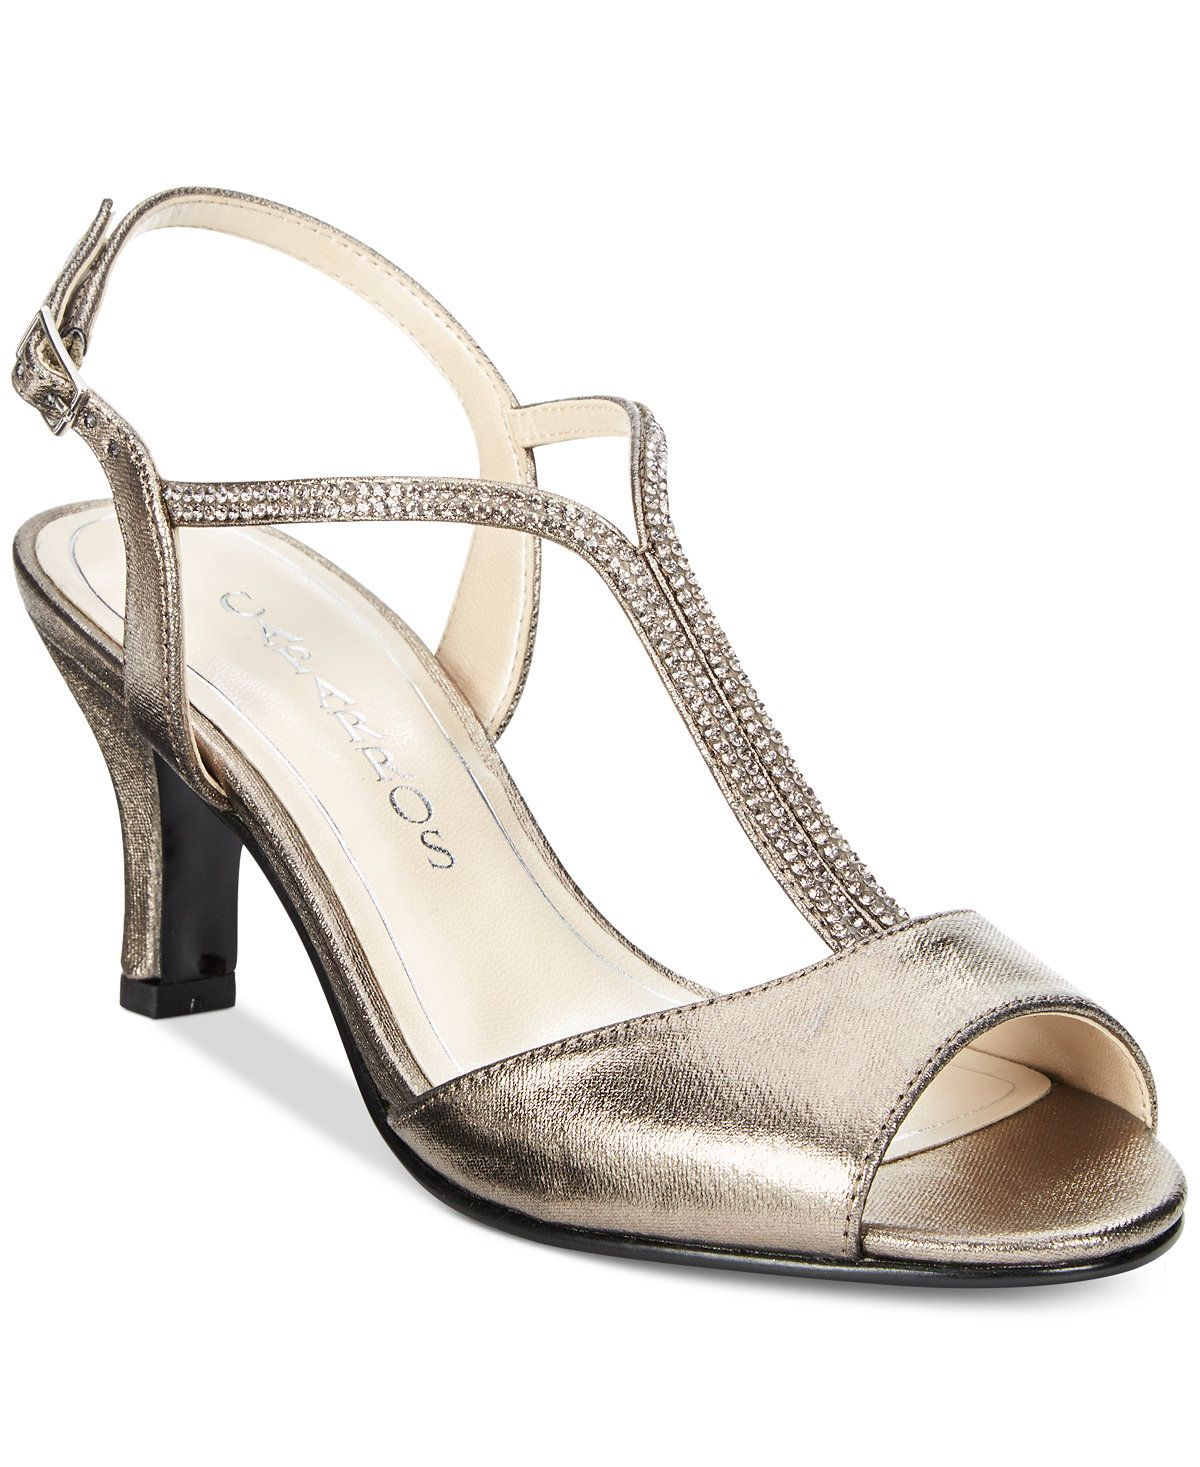 e6c78932436 Caparros Delicia T-Strap Evening Sandals - Sandals - Shoes - Macy s ...